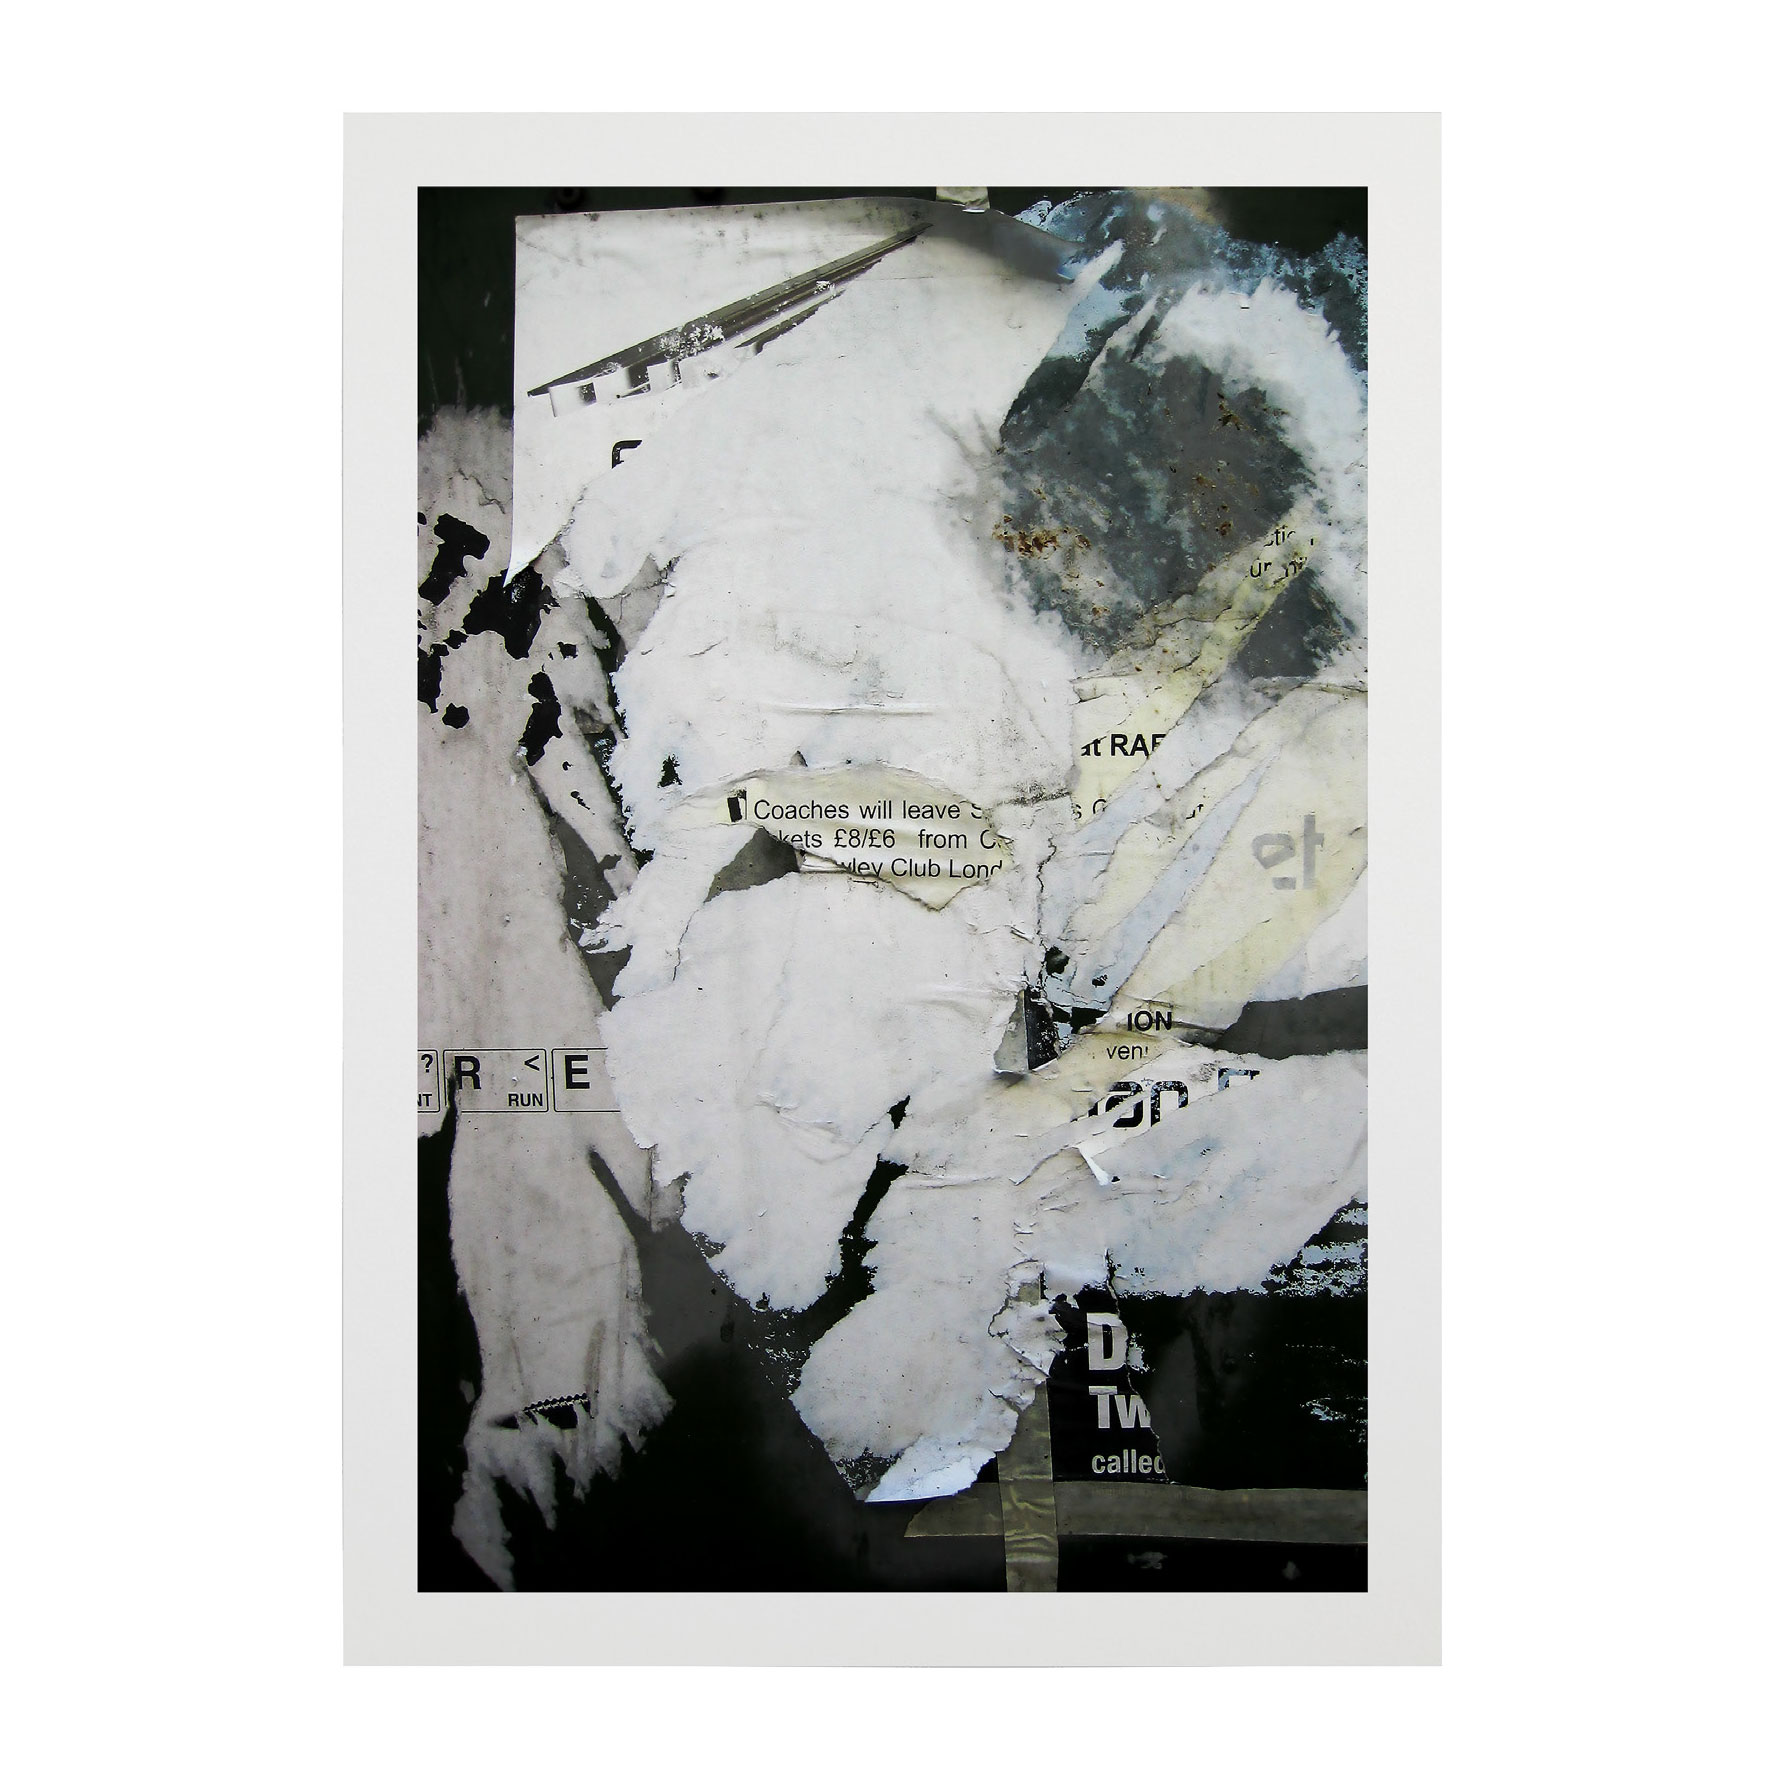 ARCHIVE-WEB-PICS-51